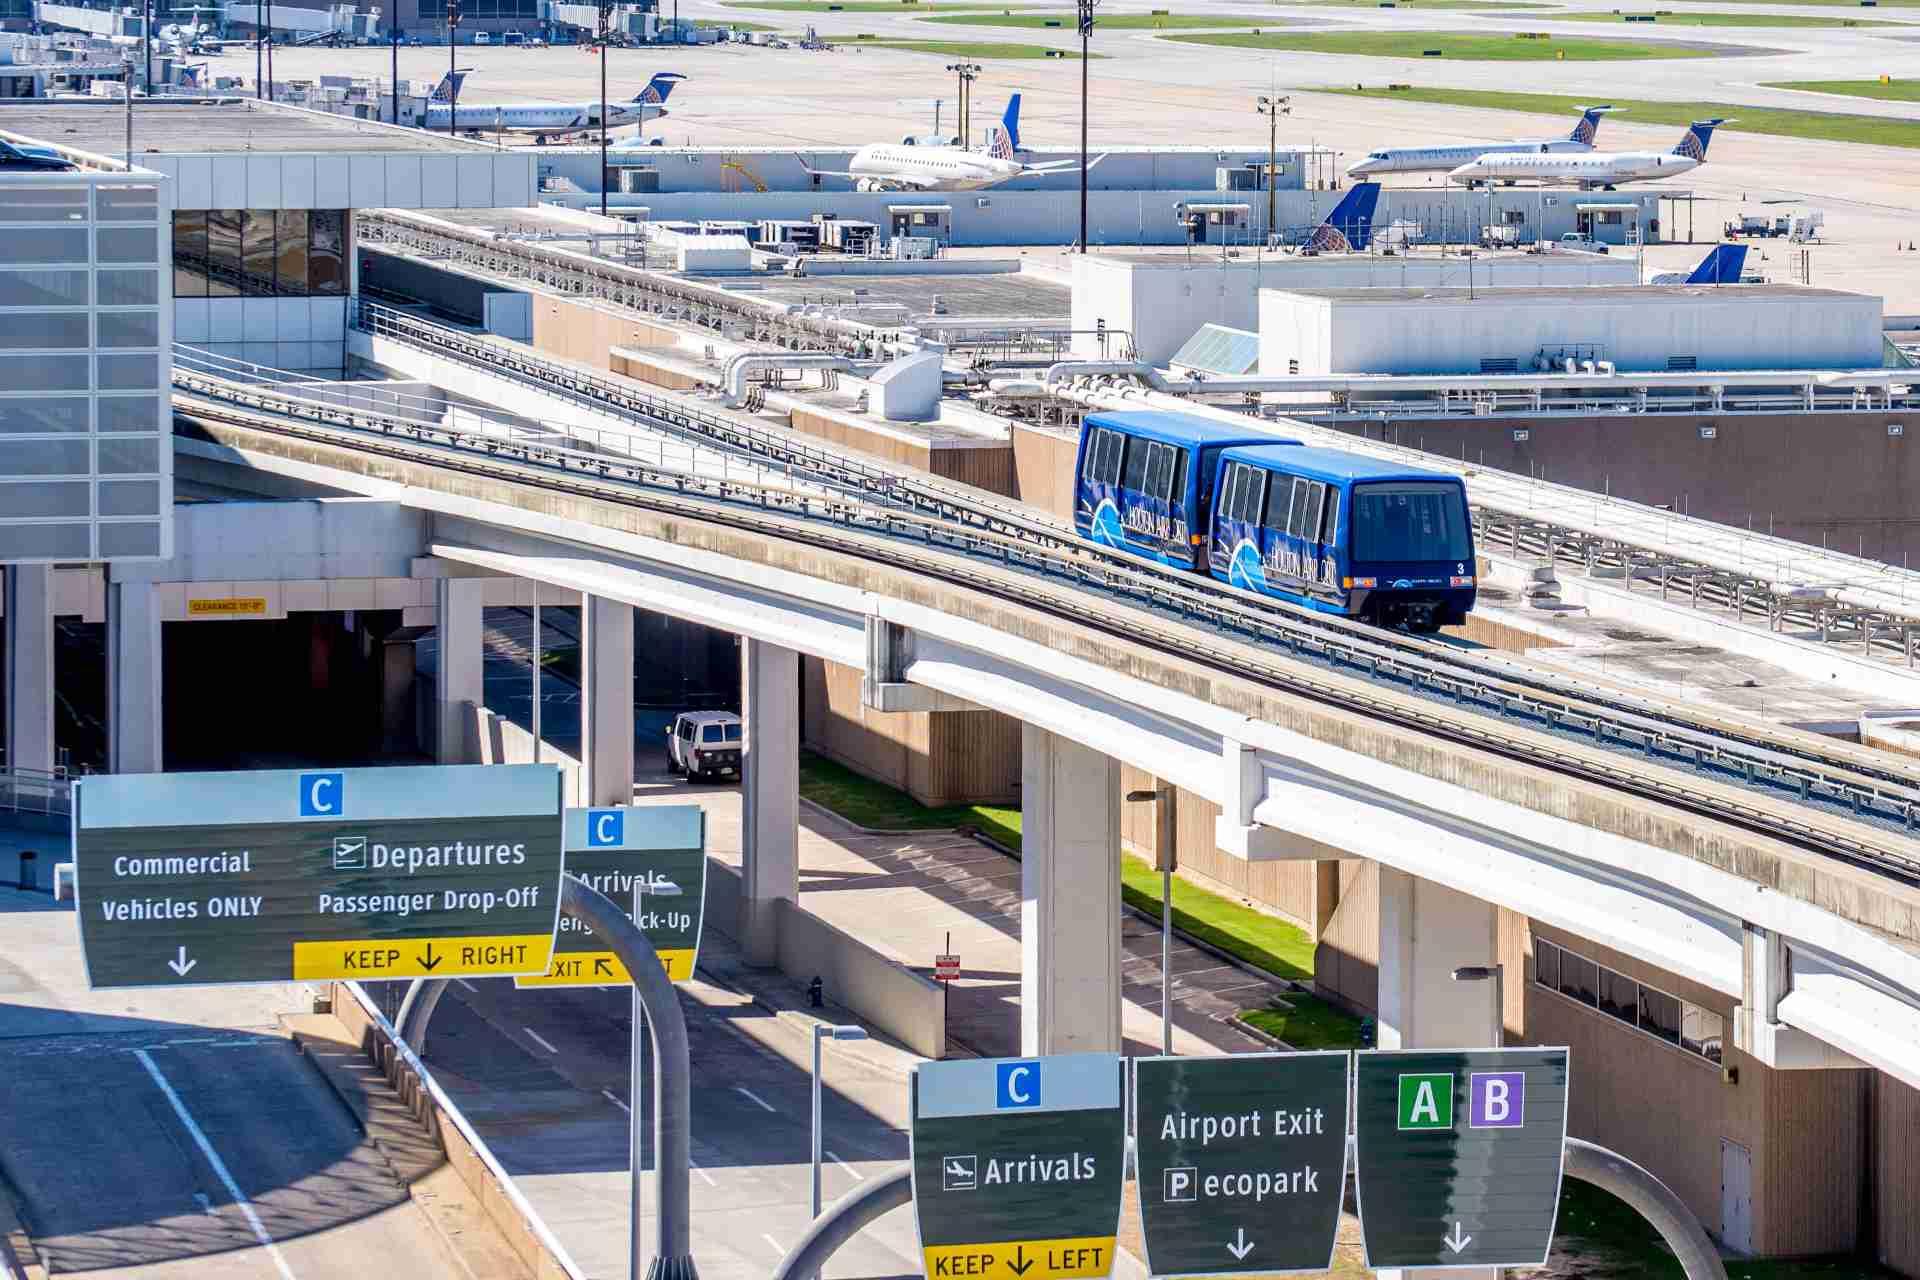 Airport Transportation Shuttle System